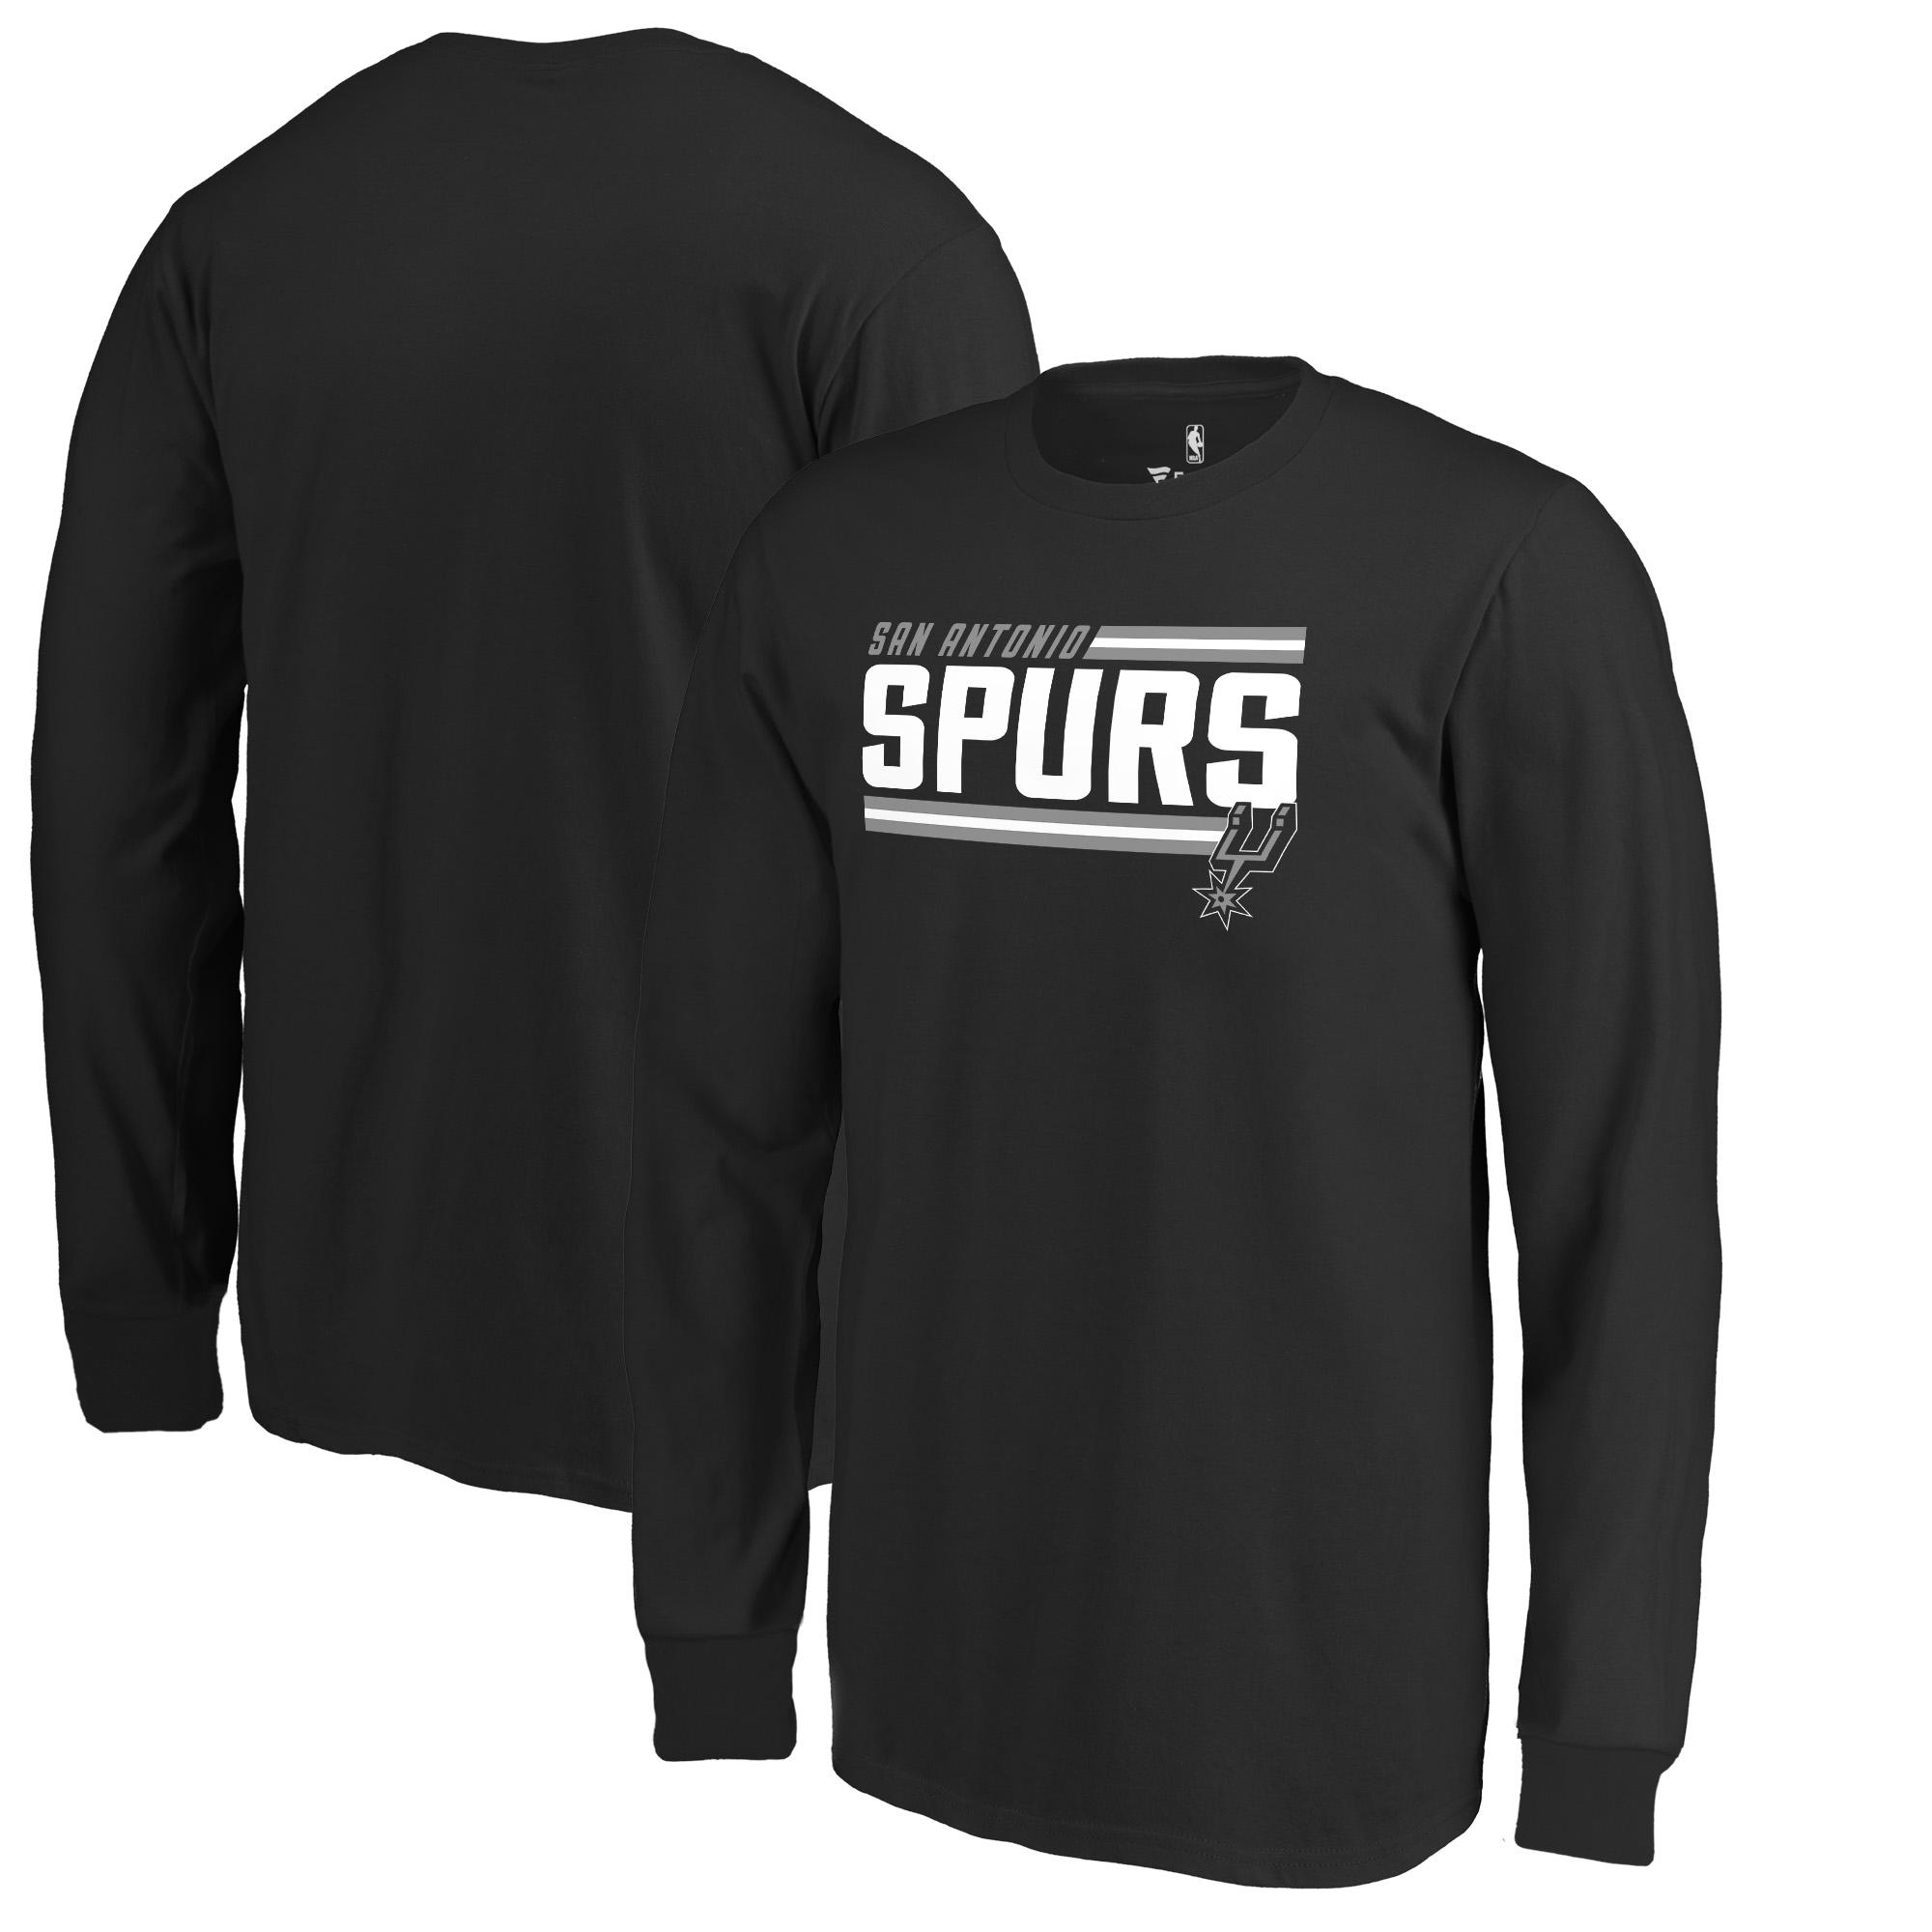 San Antonio Spurs Fanatics Branded Youth Onside Stripe Long Sleeve T-Shirt - Black